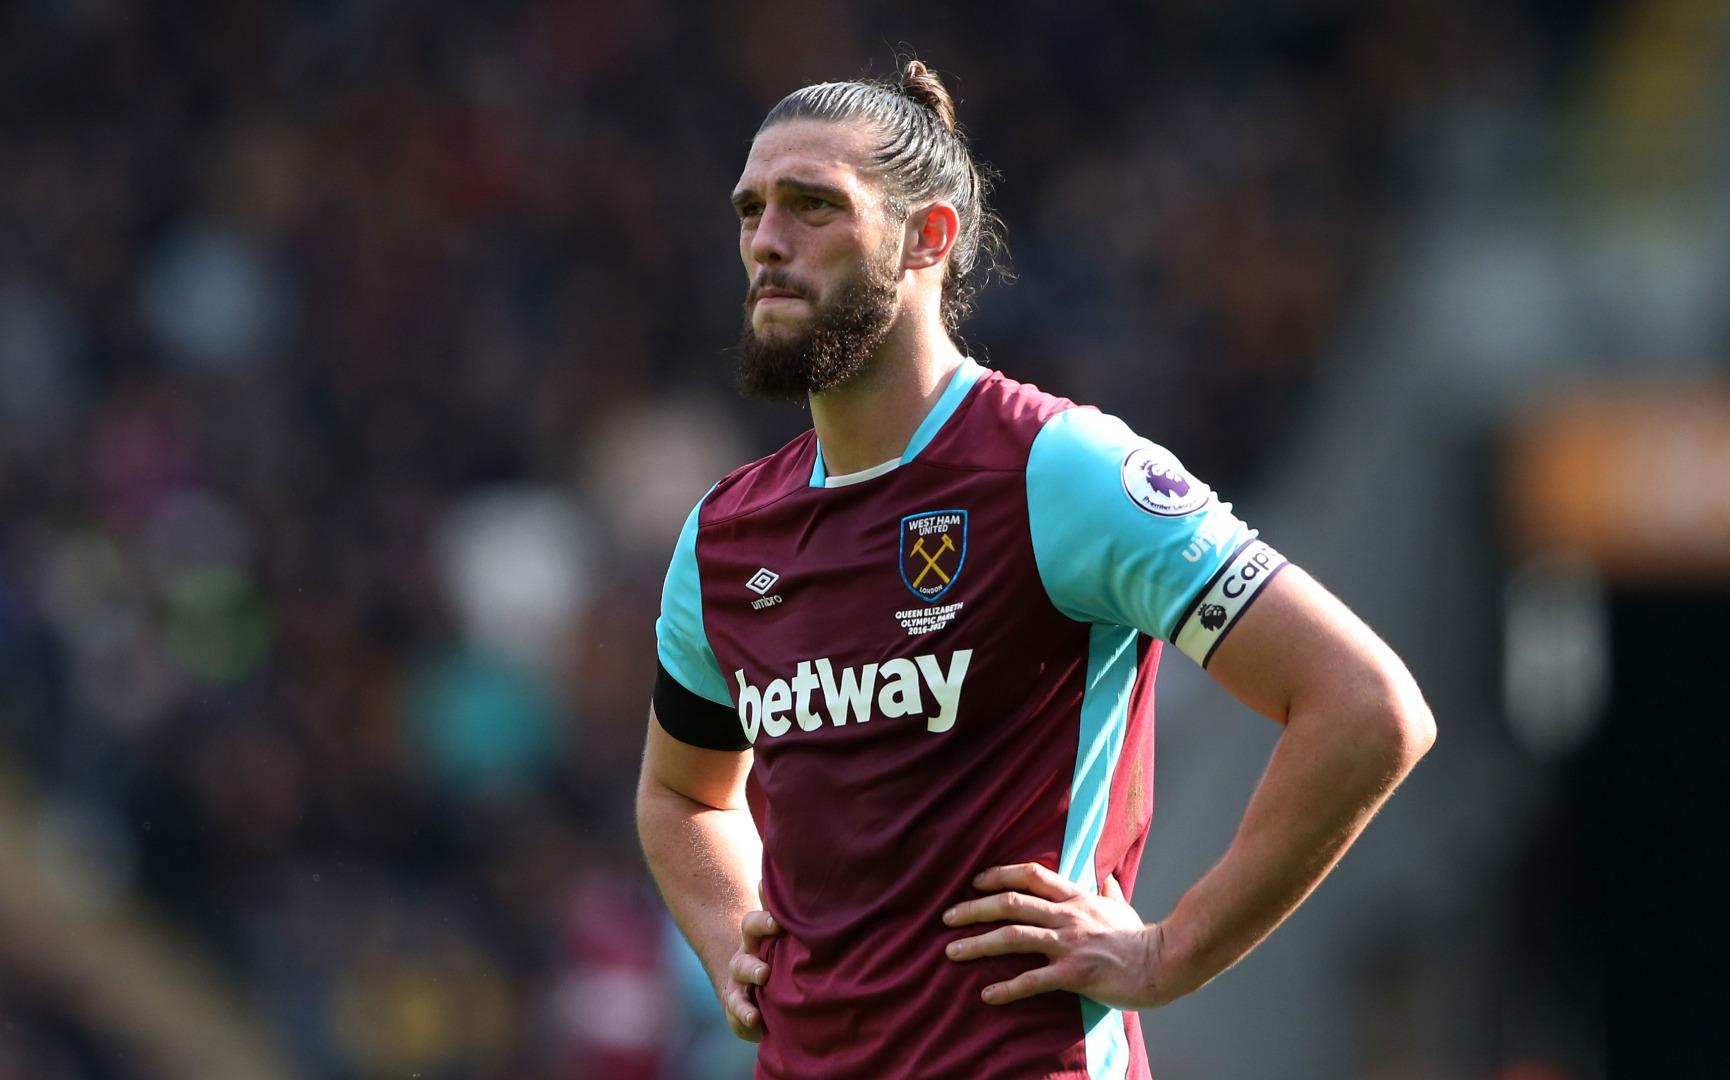 Andy Carroll West Ham'ı galibiyete taşıdı